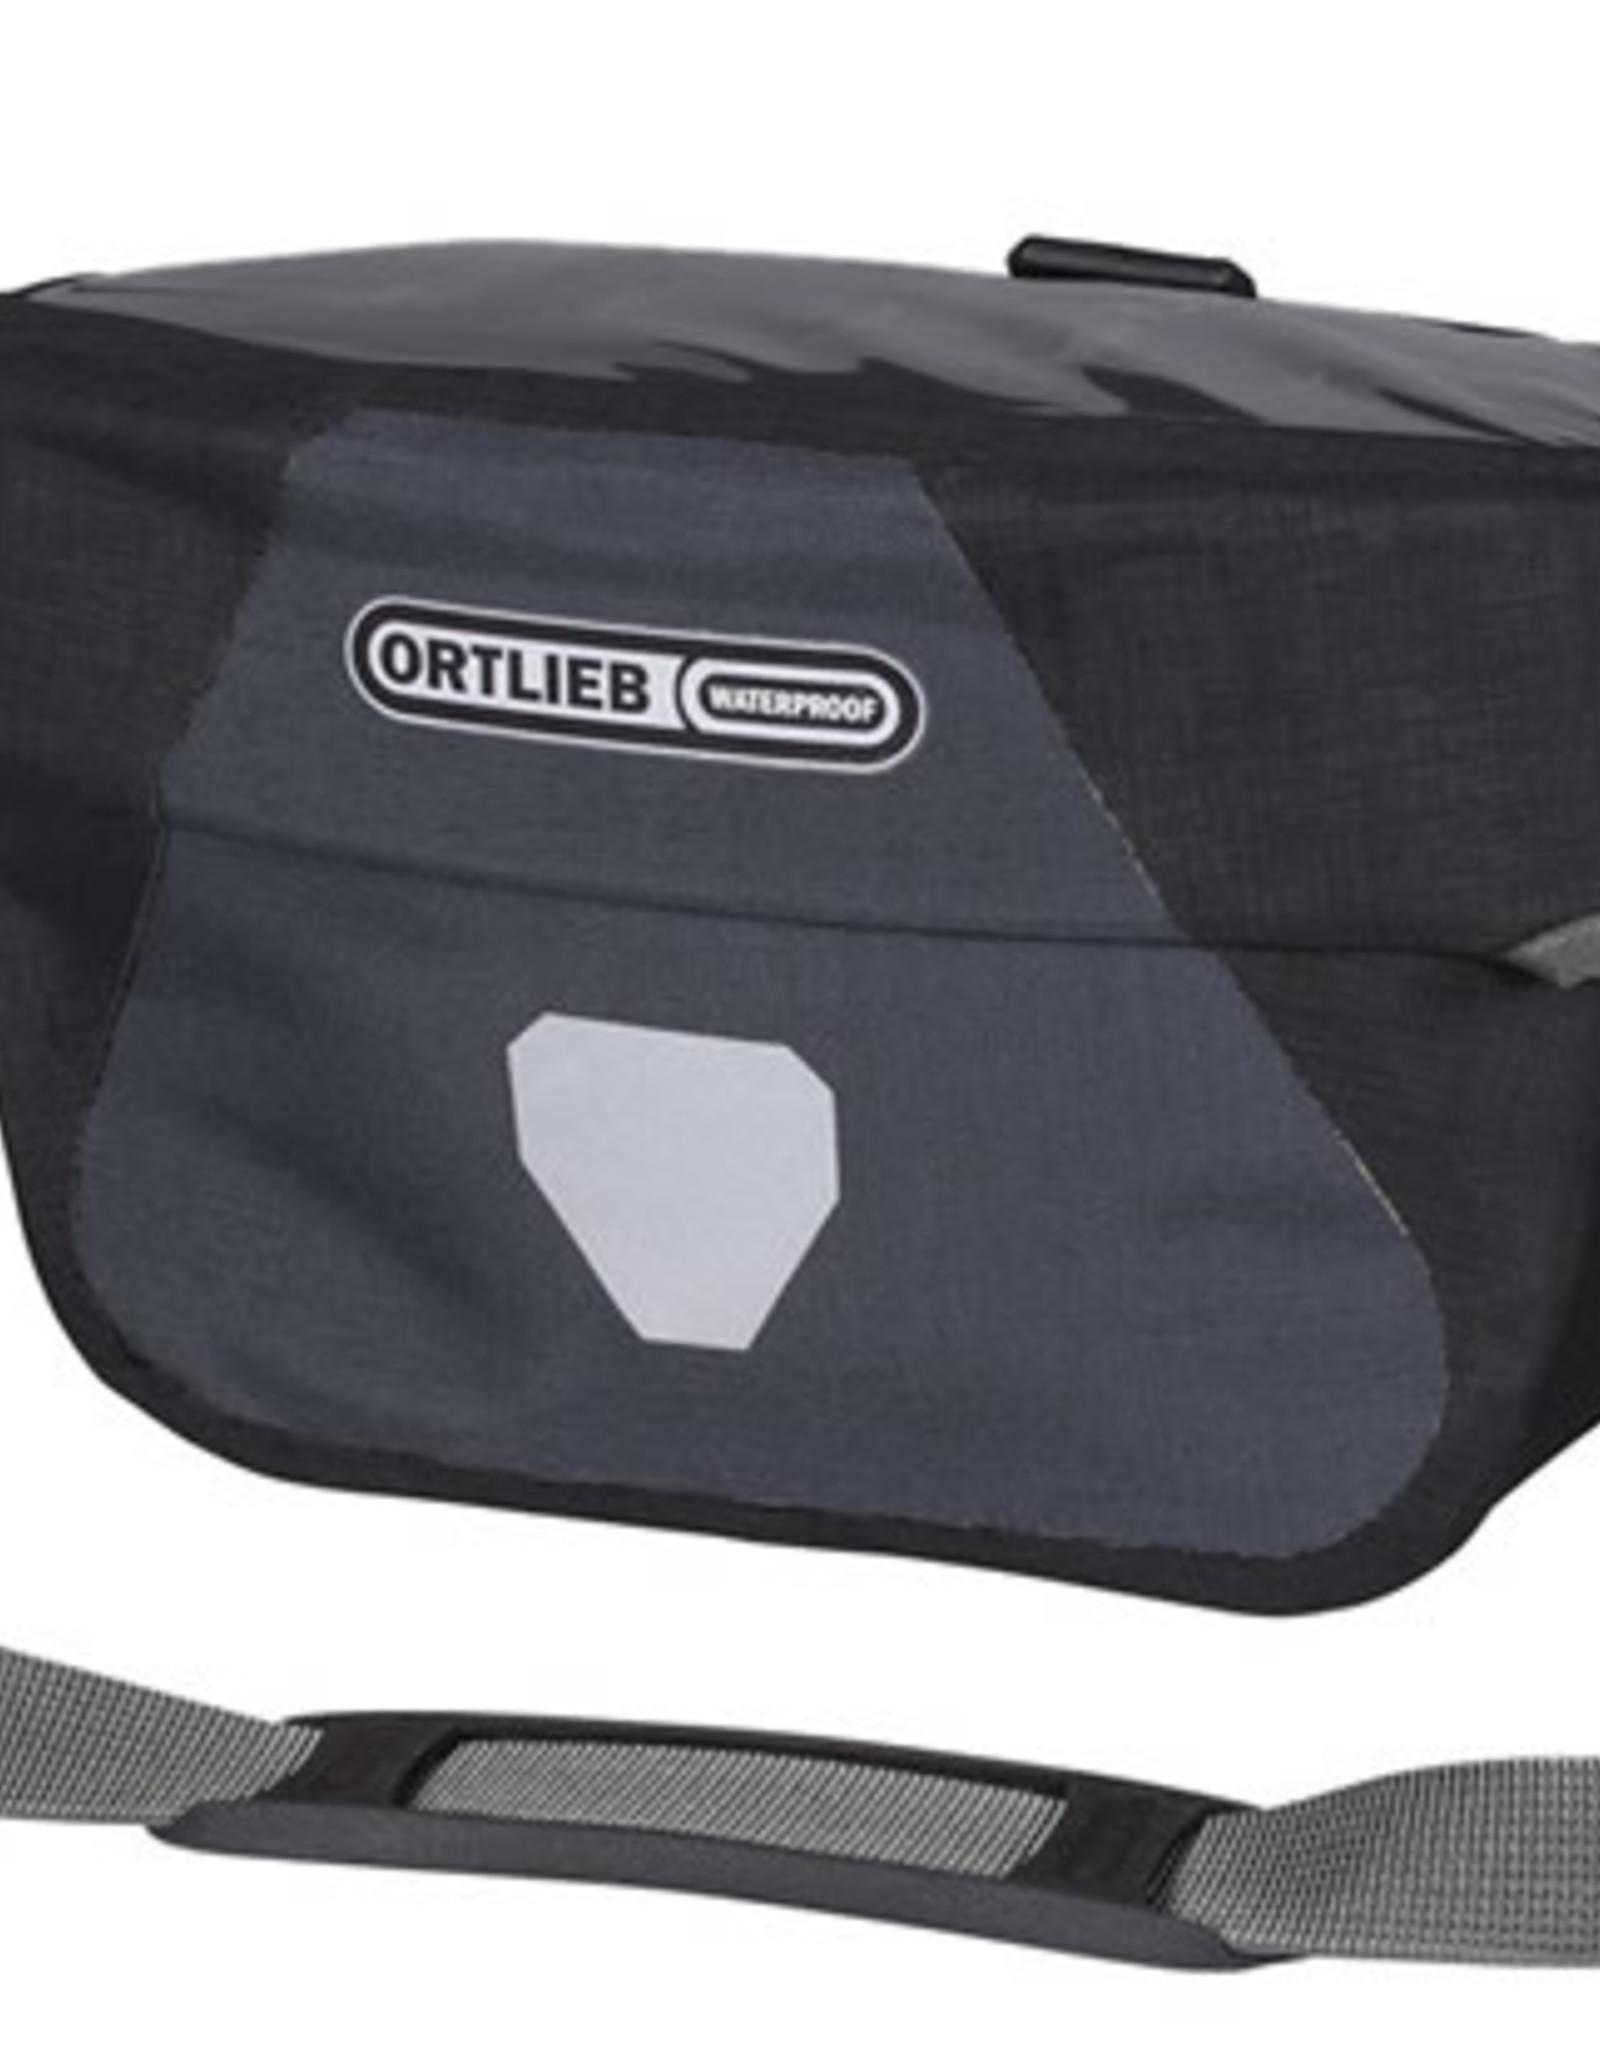 Ortlieb Sportartikel GmbH Ortlieb Ultimate Six Plus 5L Handlebar Bag